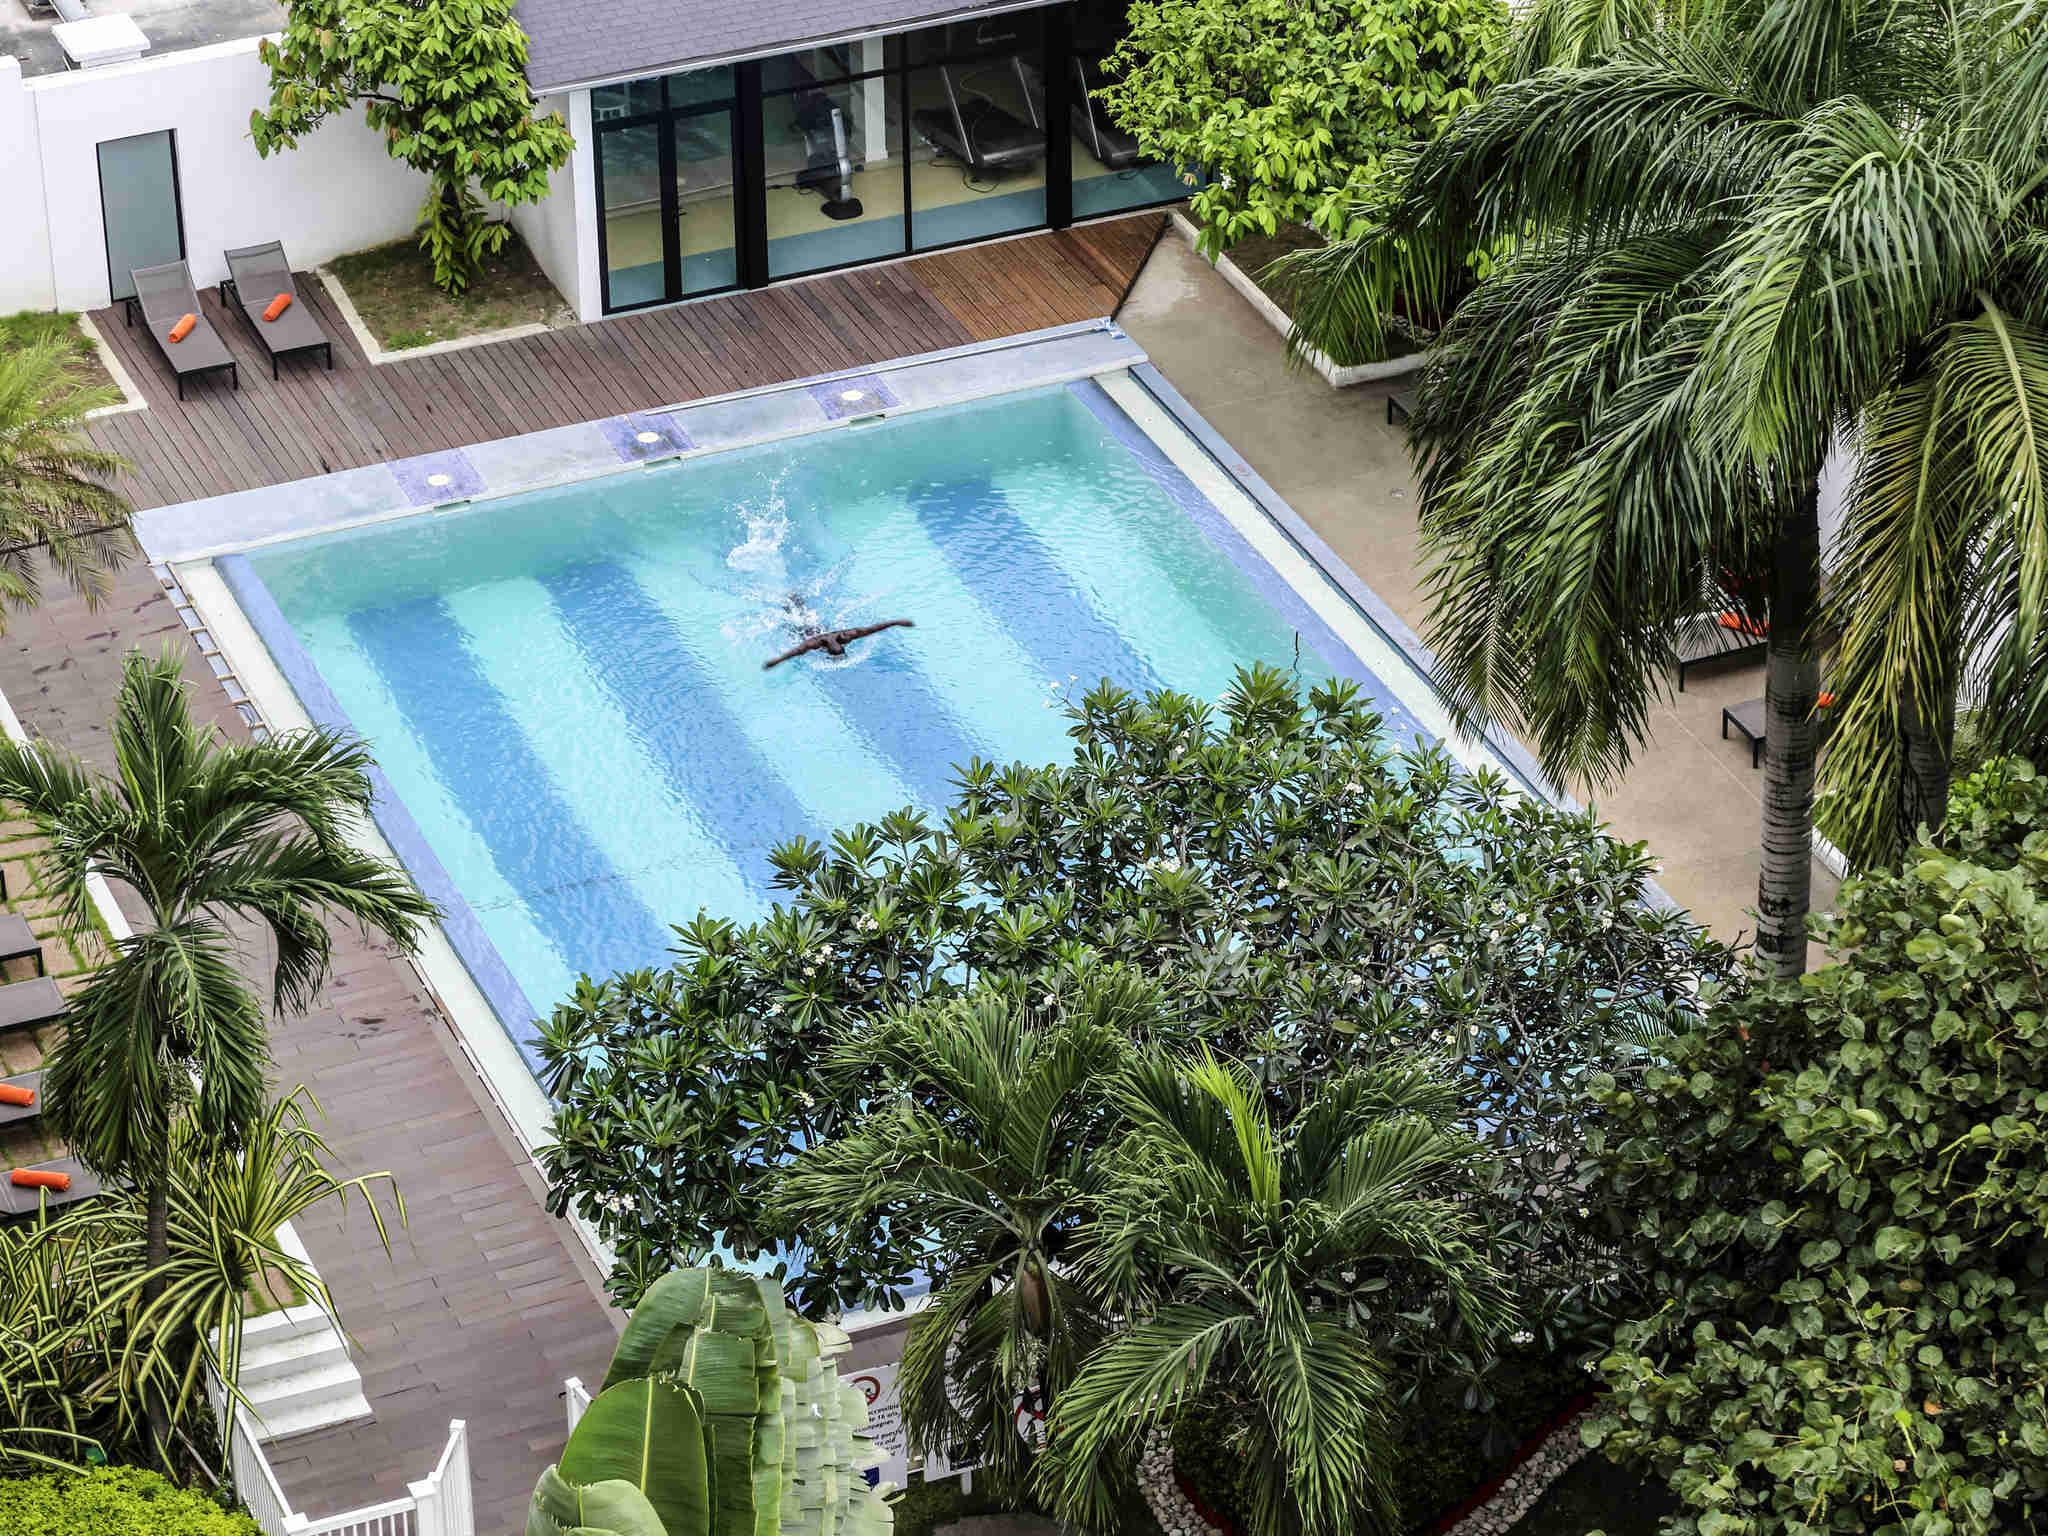 Novotel Abidjan For the business travellers